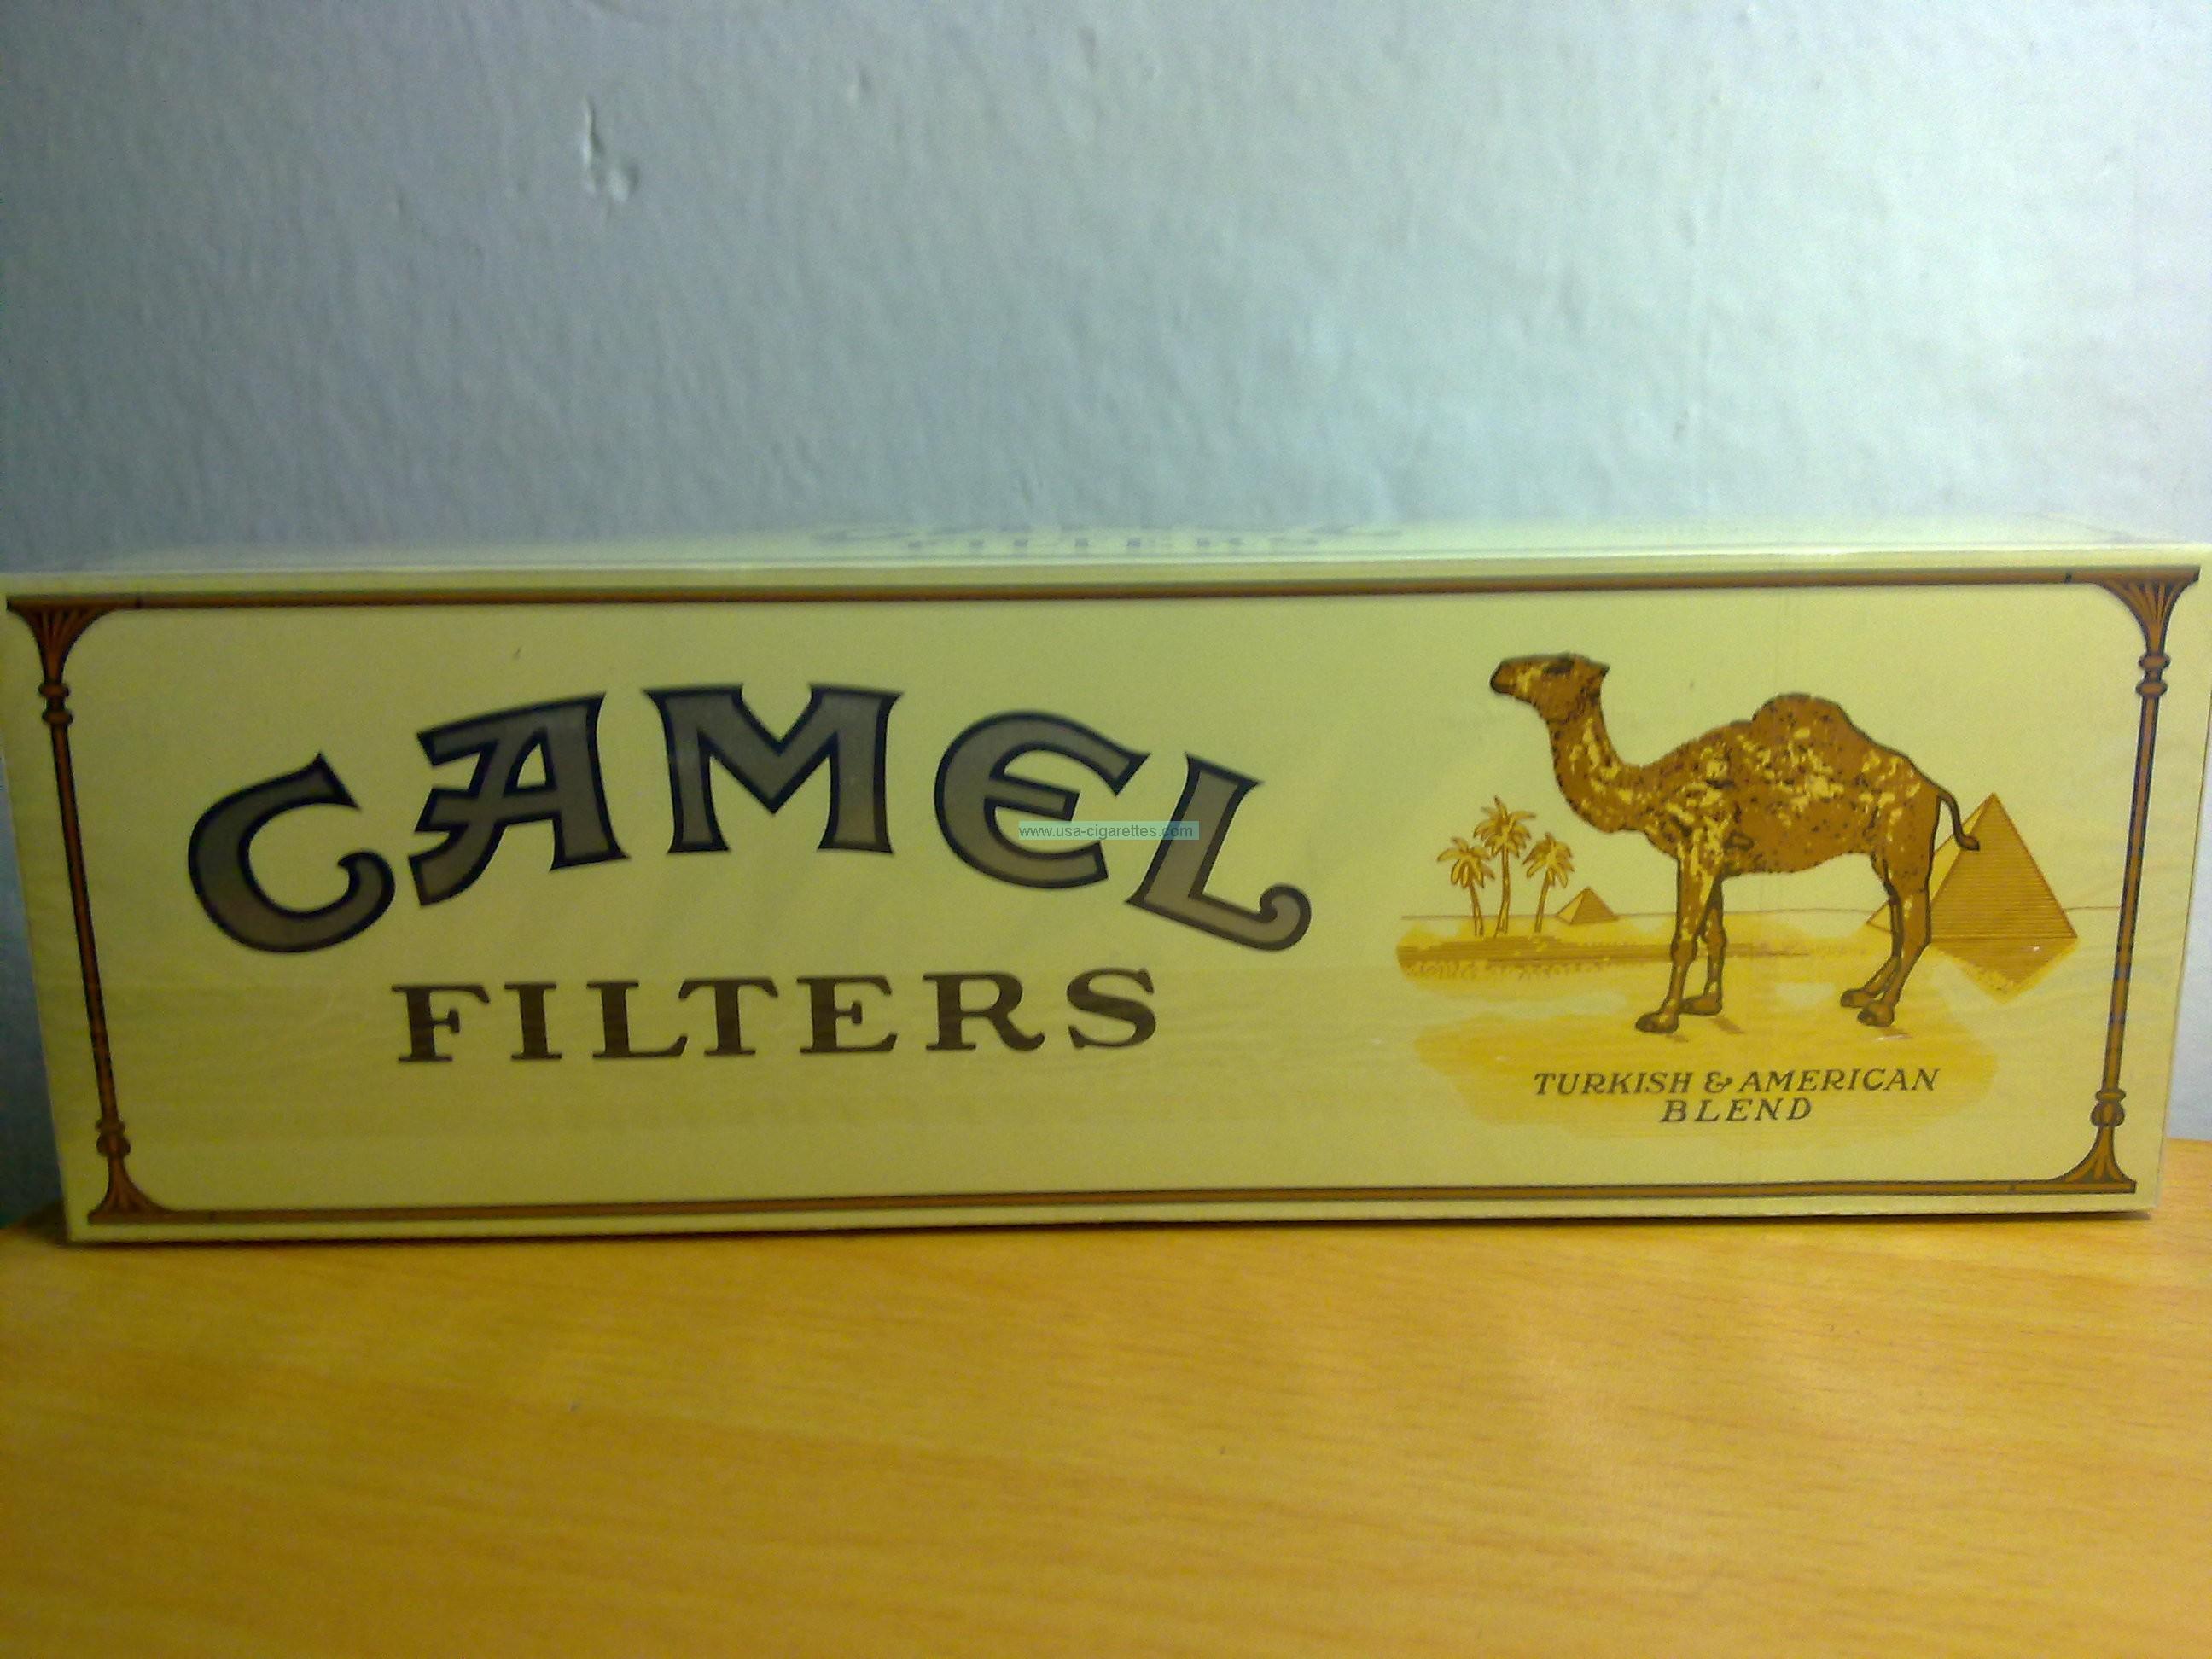 camel filters gold cigarettes